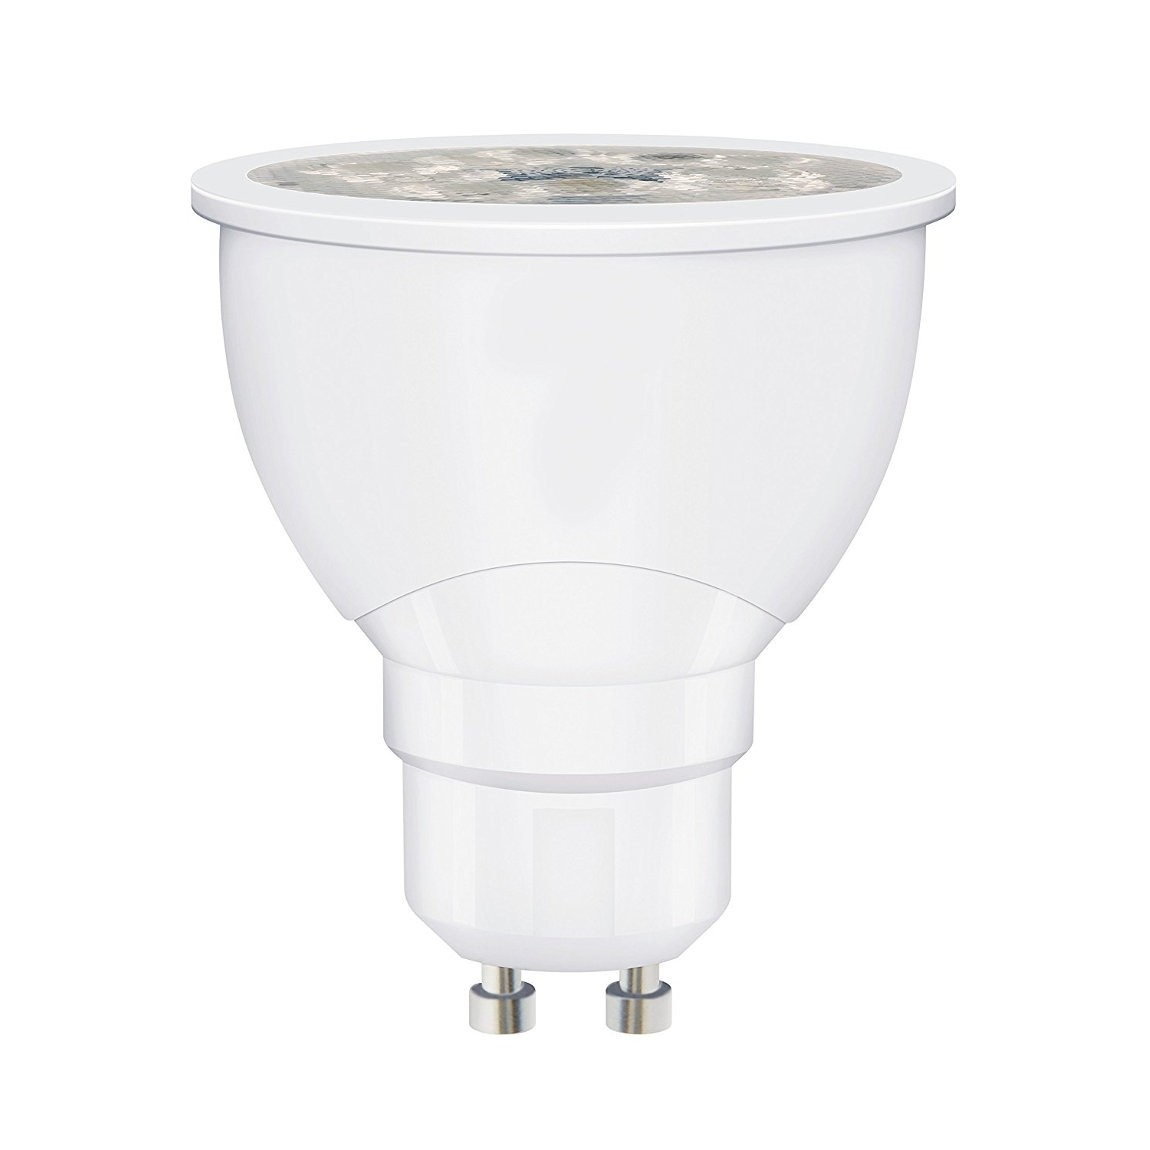 Osram Smart+ LED-Spot GU10 Tunable White - Weiß